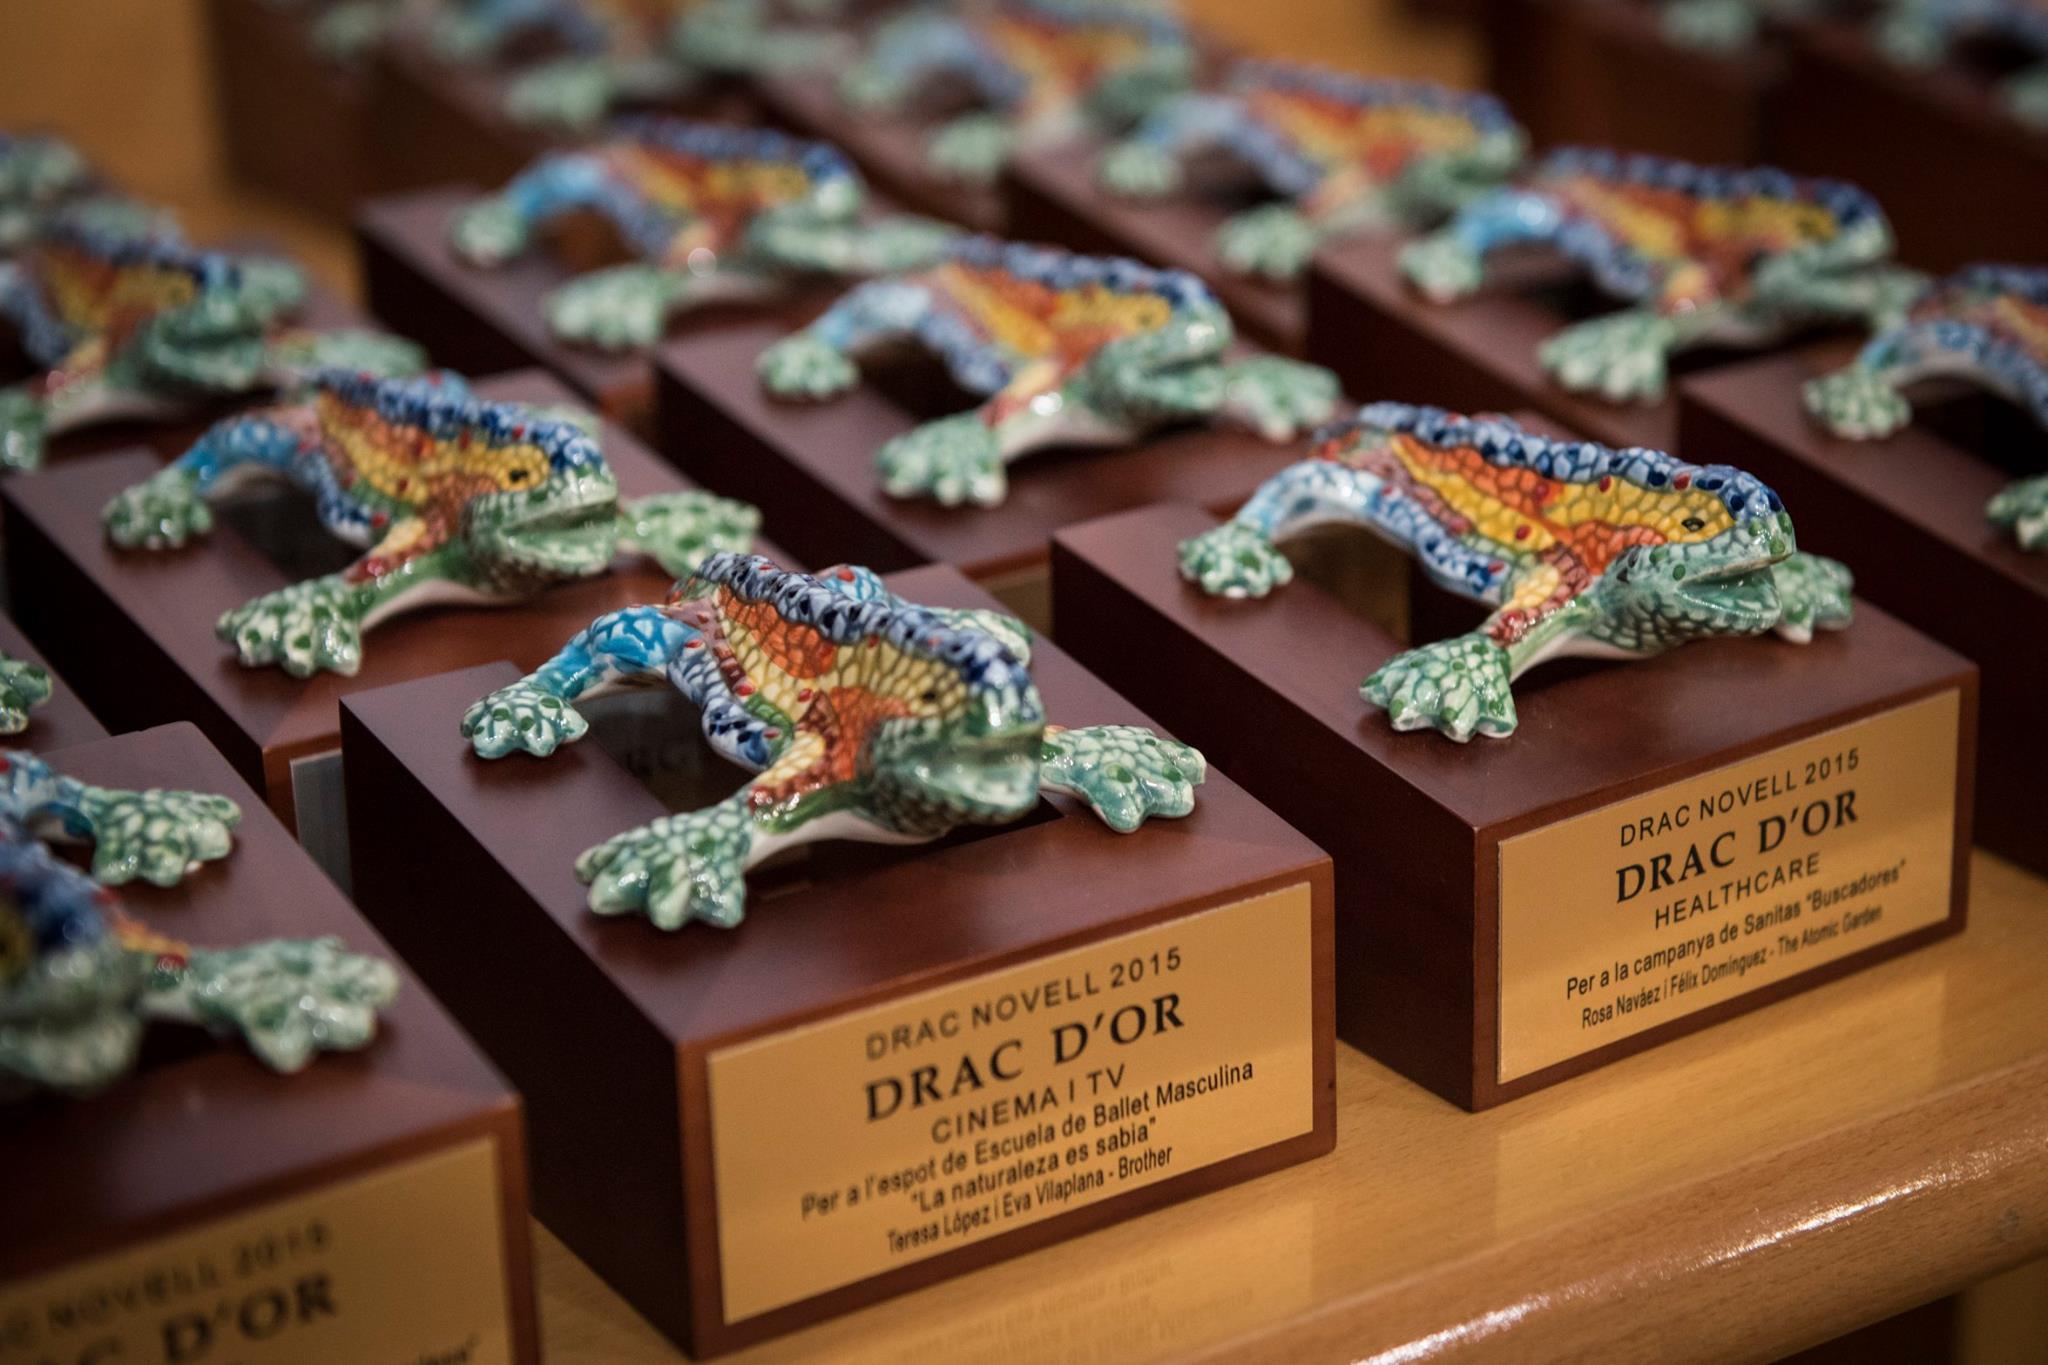 Innuo ha patrocinat els Premis Drac Novell 2015